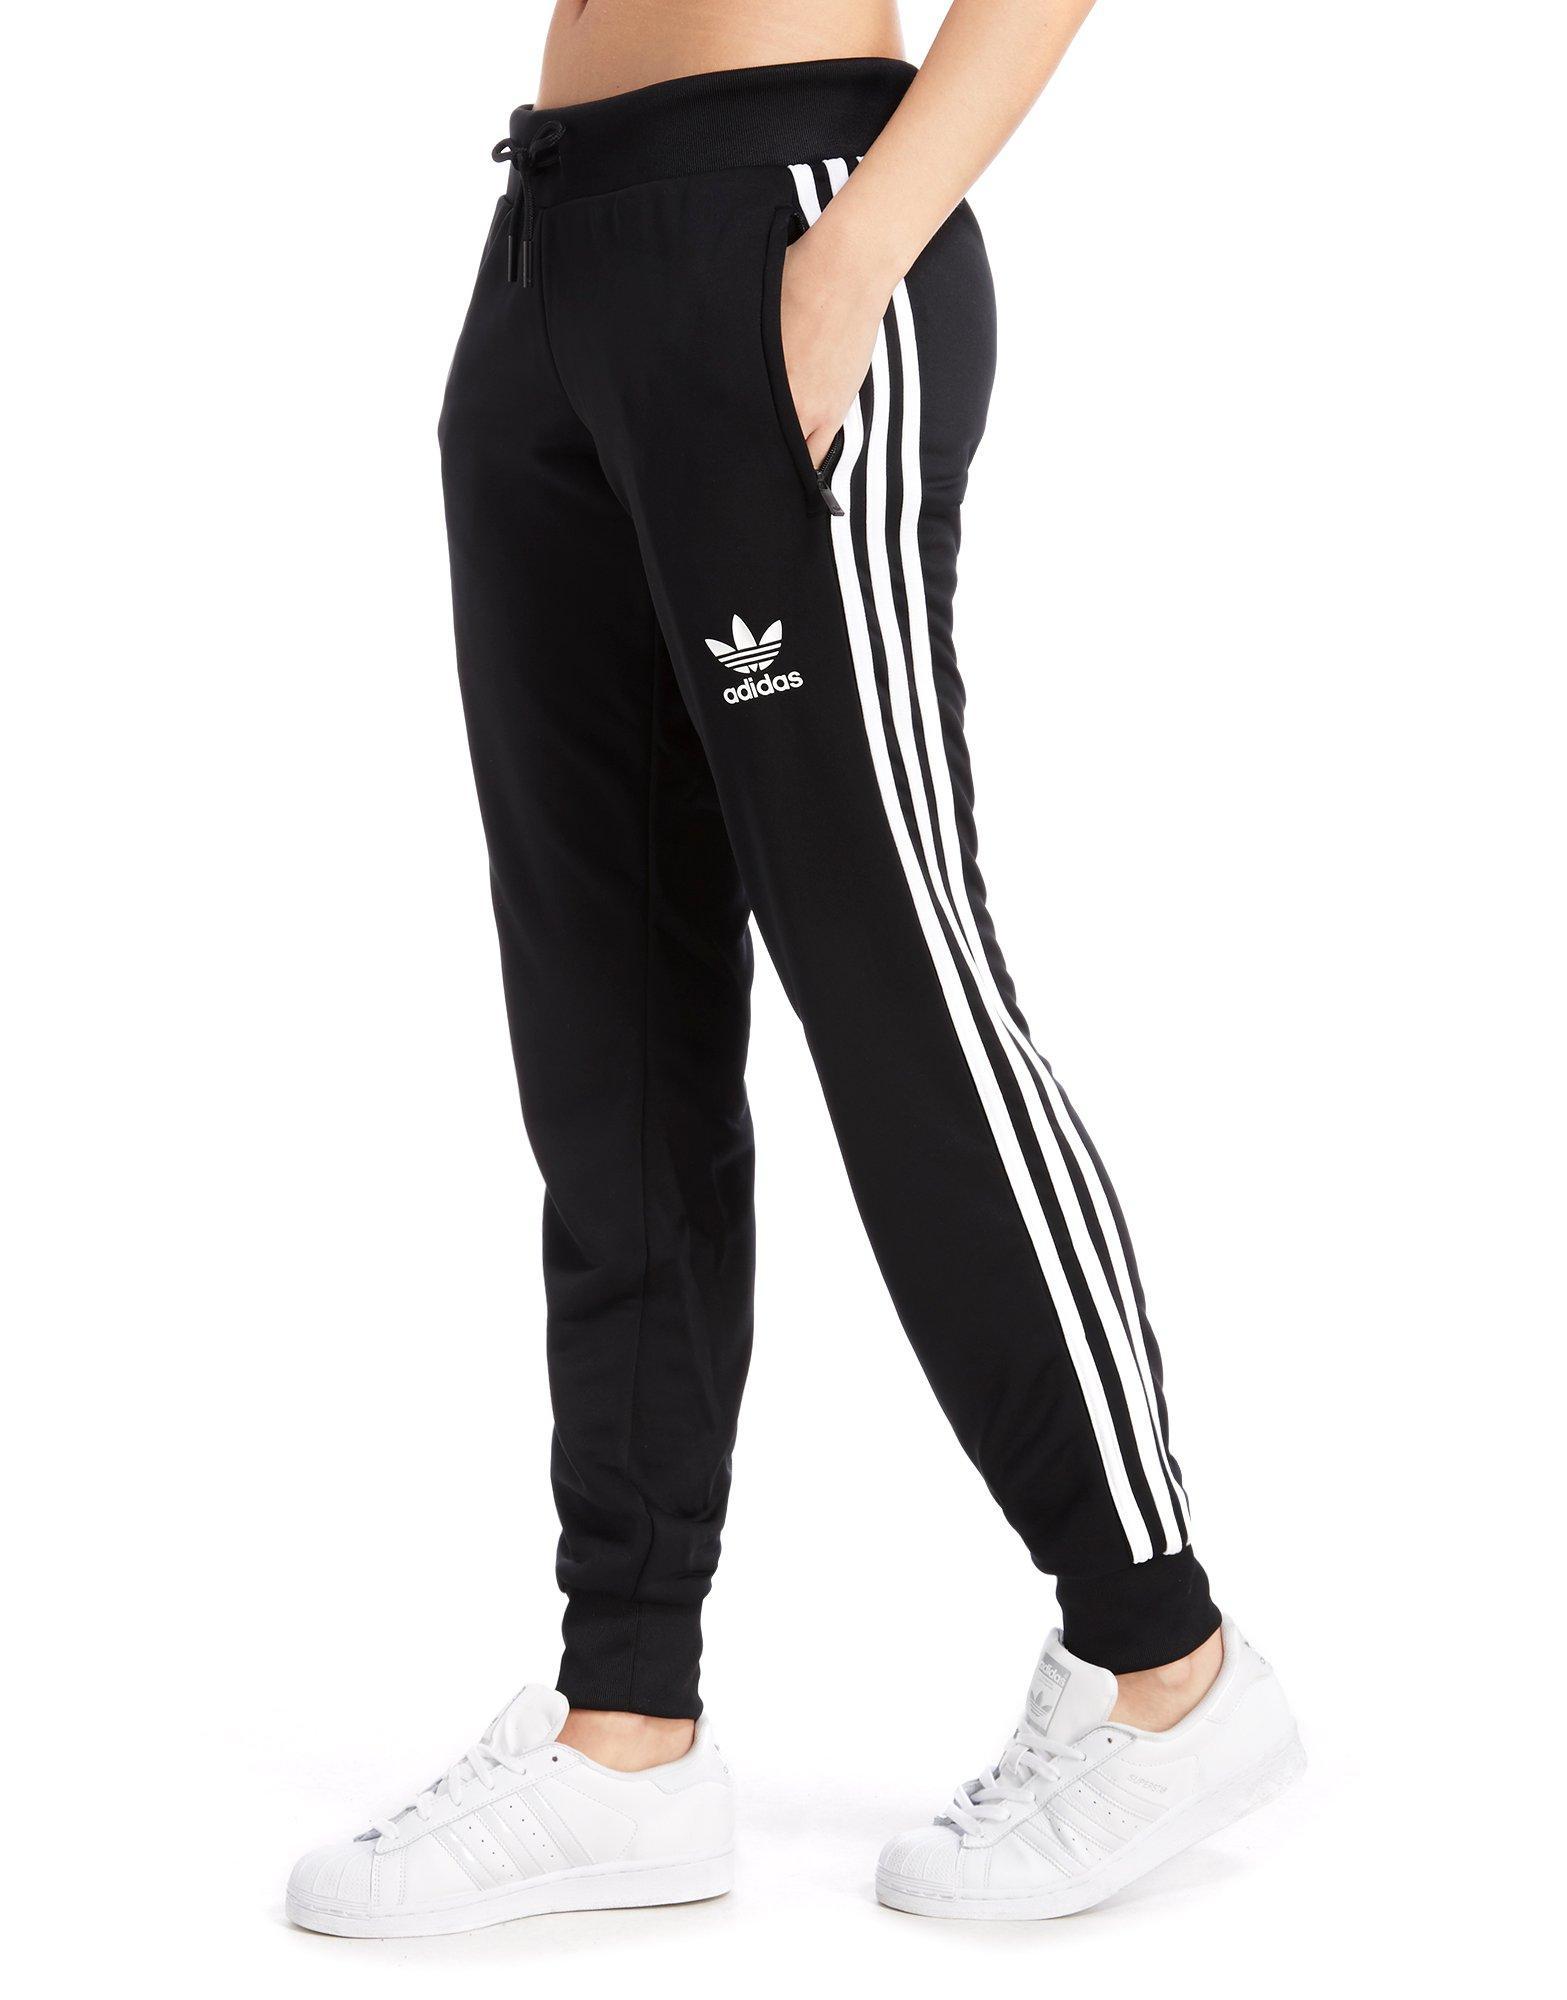 jd_200954_a?qlt=80 sale adidas originals womens clothing jd sports,Womens Clothing Adidas